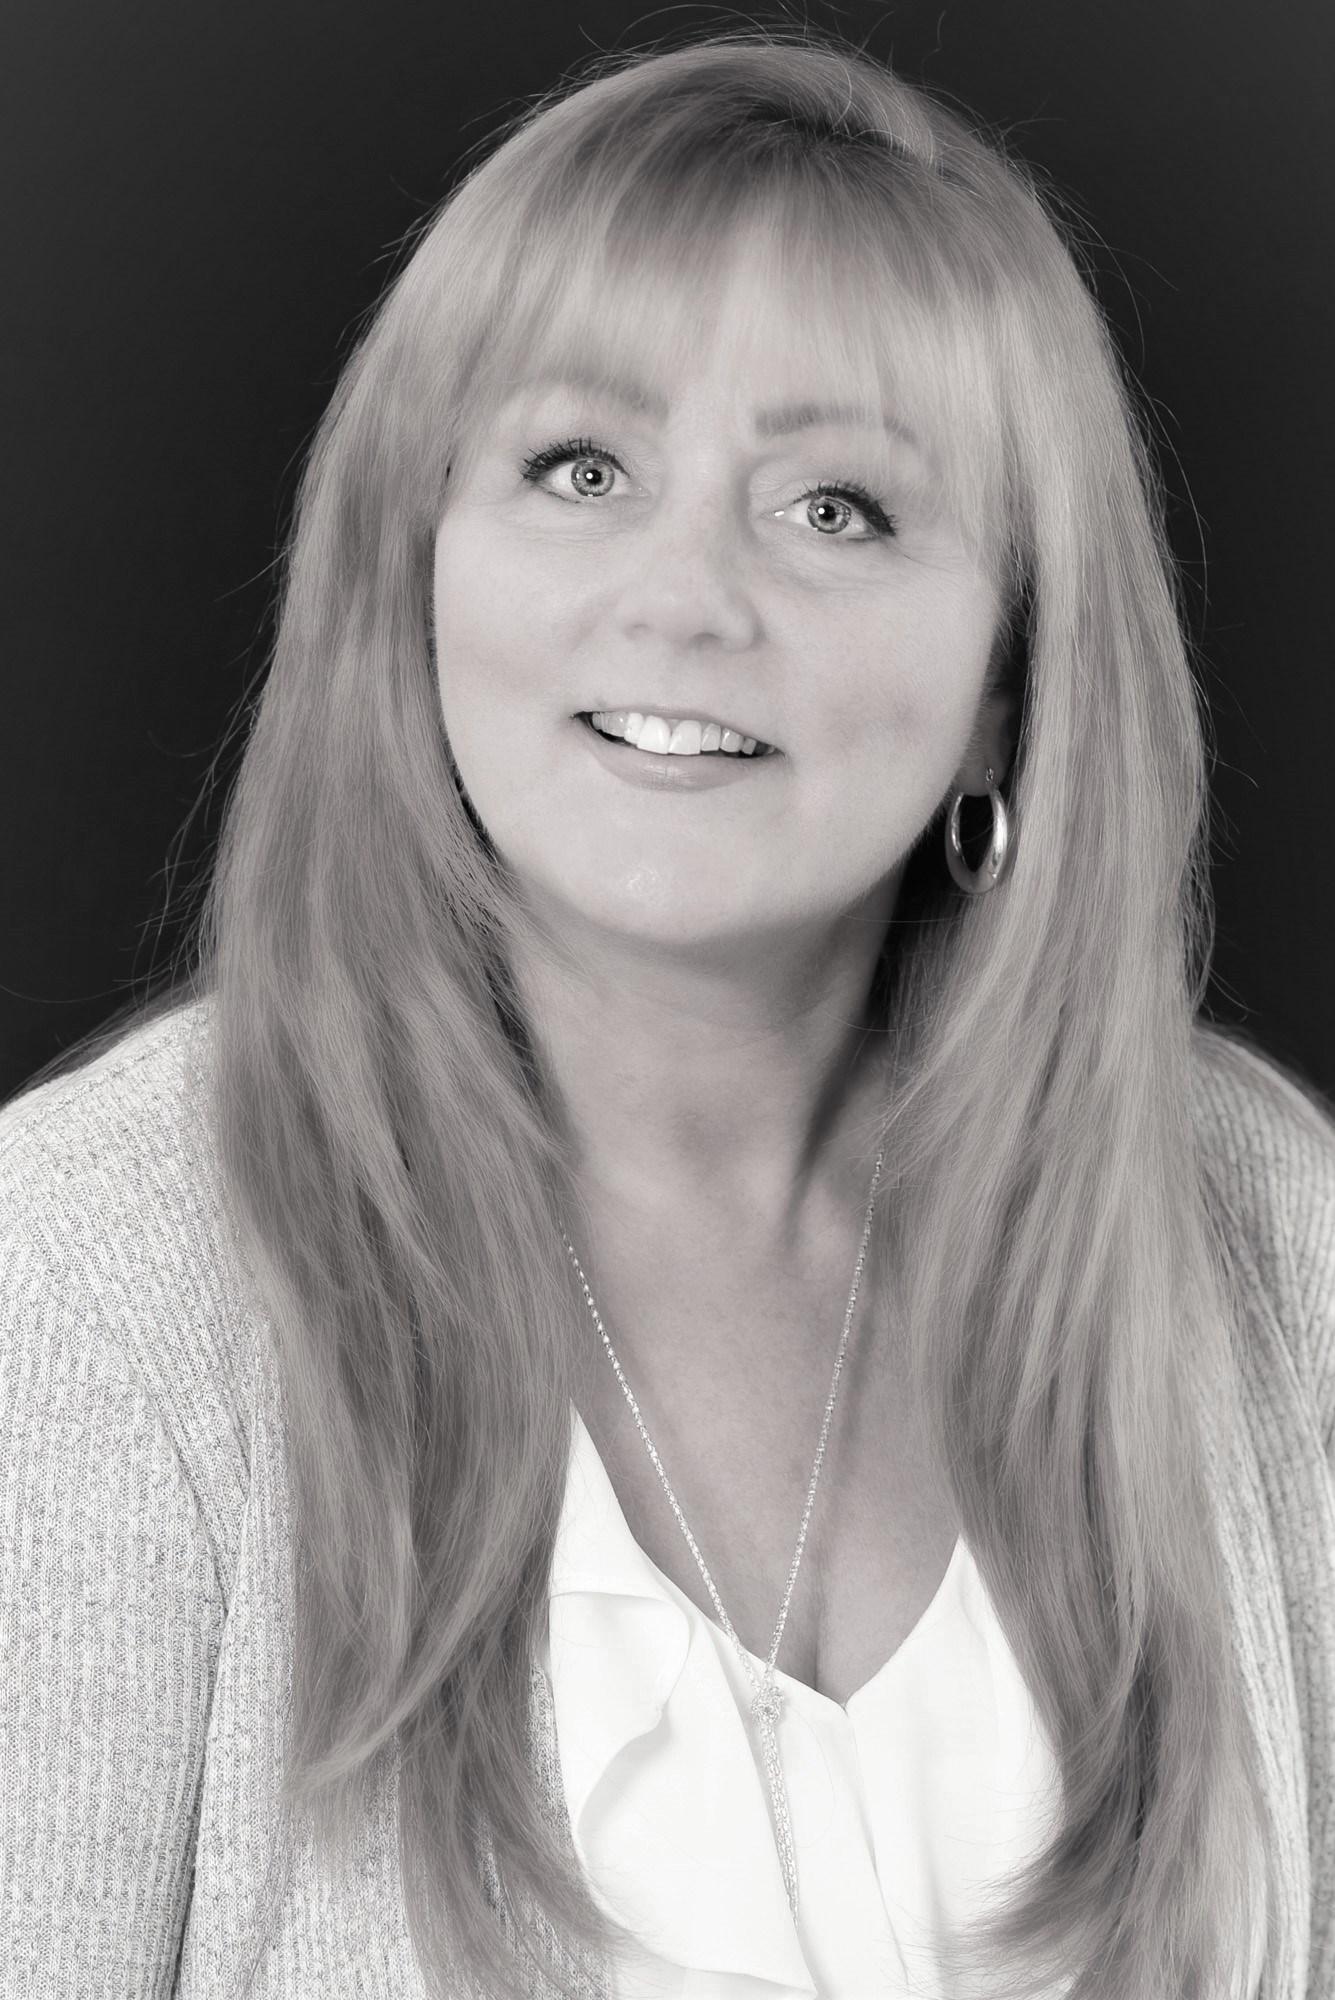 Brenda Paetzold